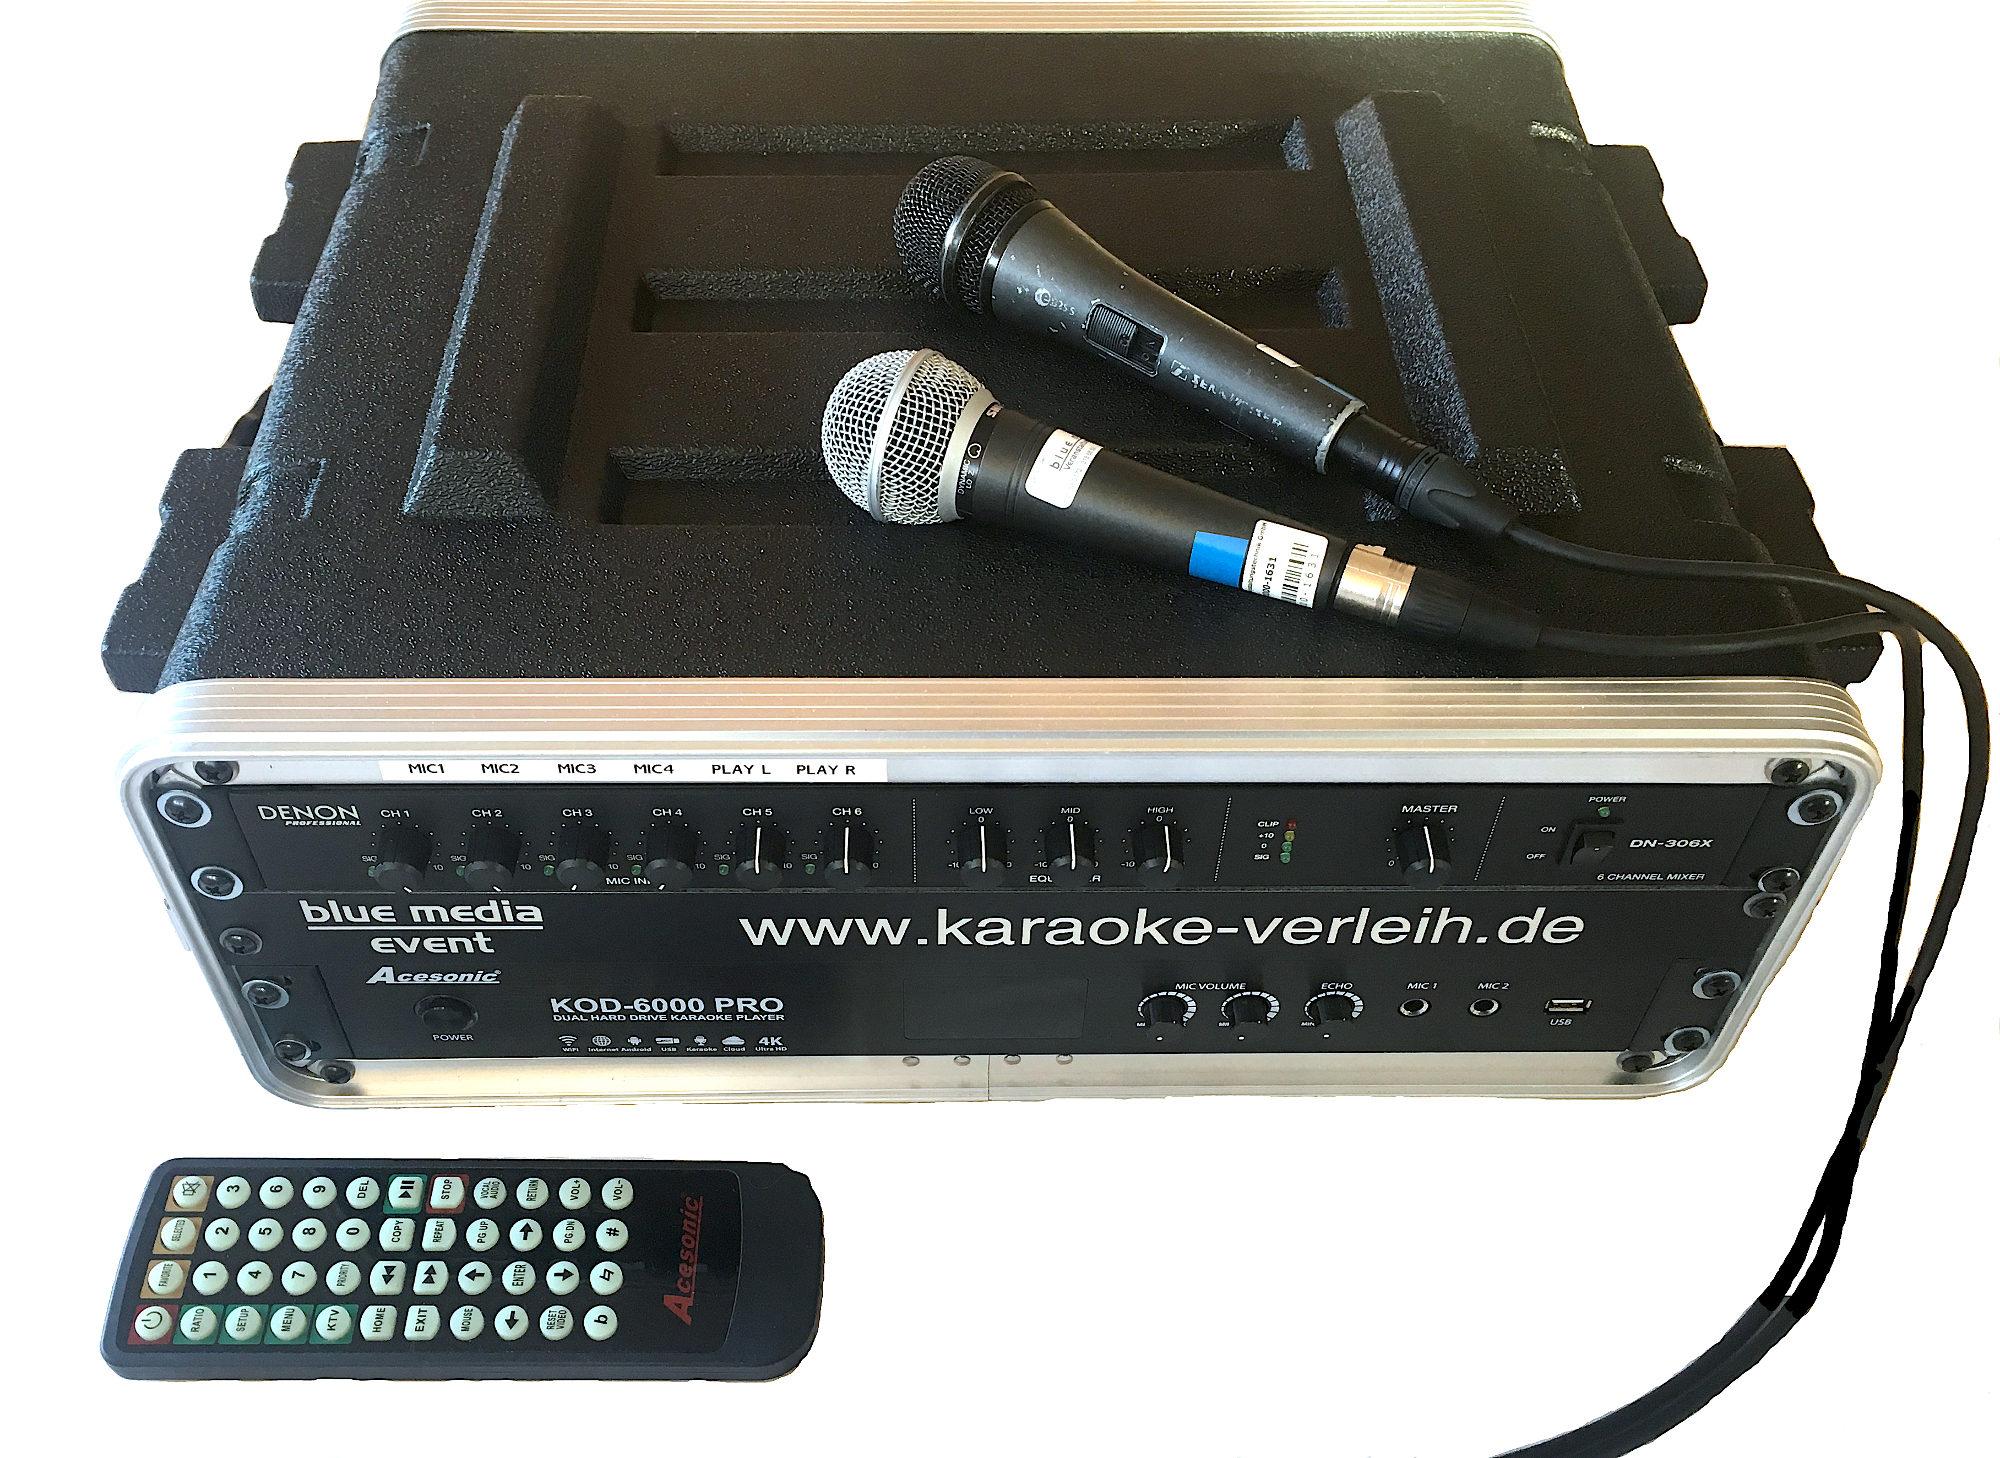 karaokeanlage mieten Verleih Berlin Karaoke Jukebox